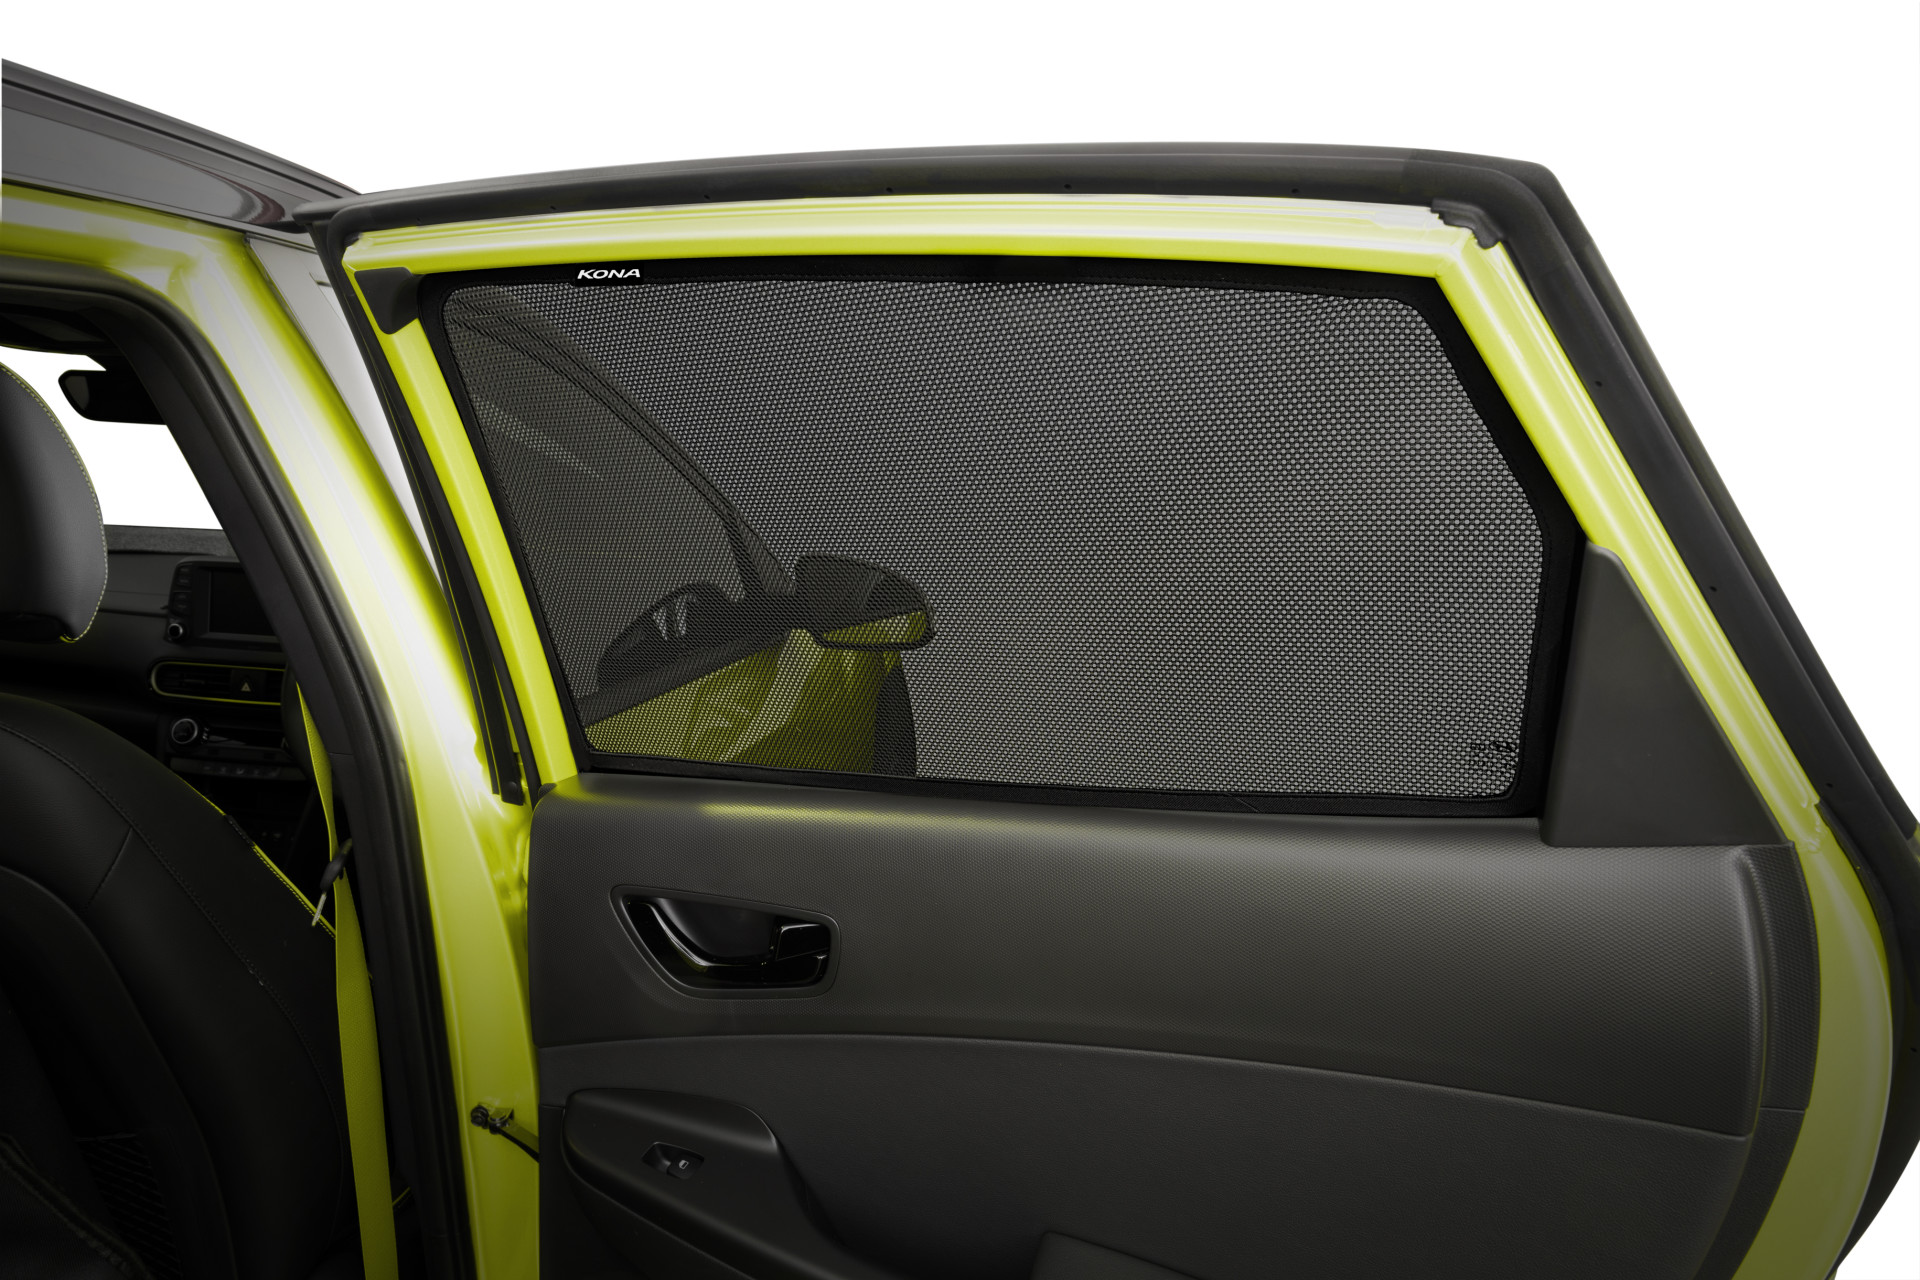 Hyundai I30n >> Kona Urban SUV Accessories | Hyundai New Zealand